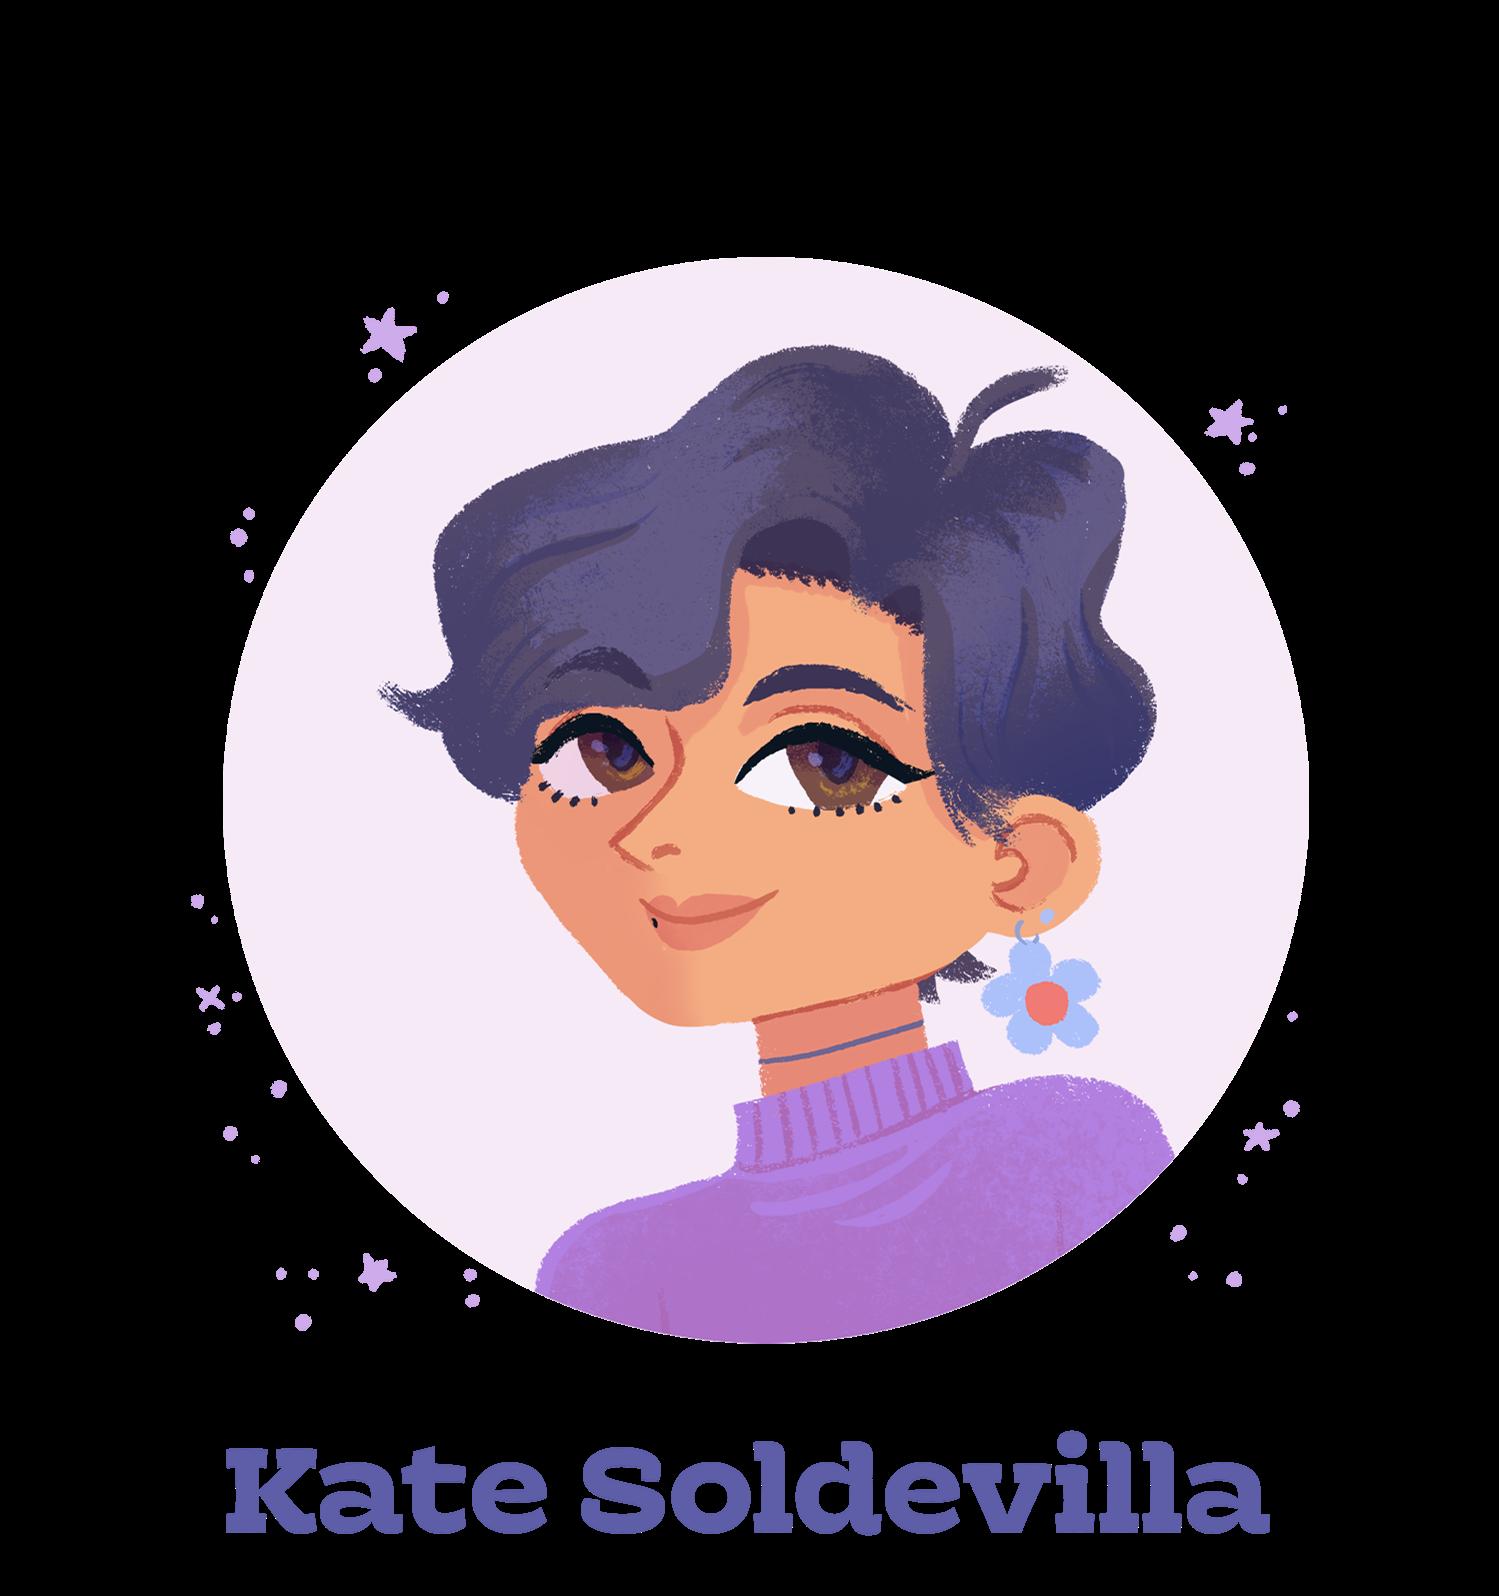 Kate Soldevilla